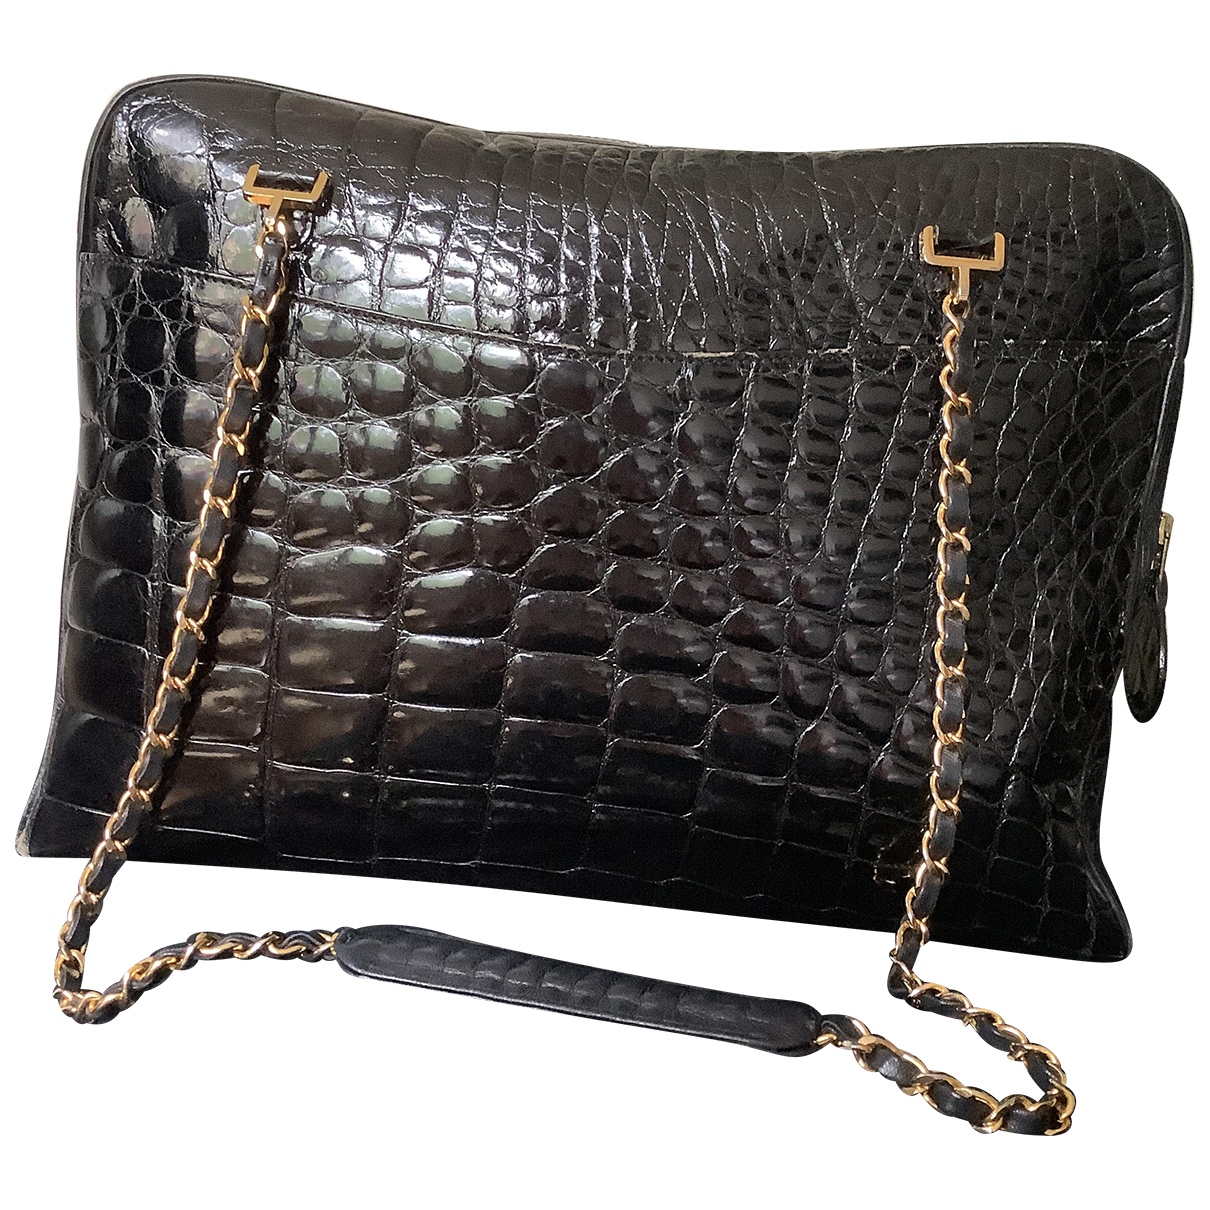 Chanel Camera Handtasche in  Schwarz Krokodil